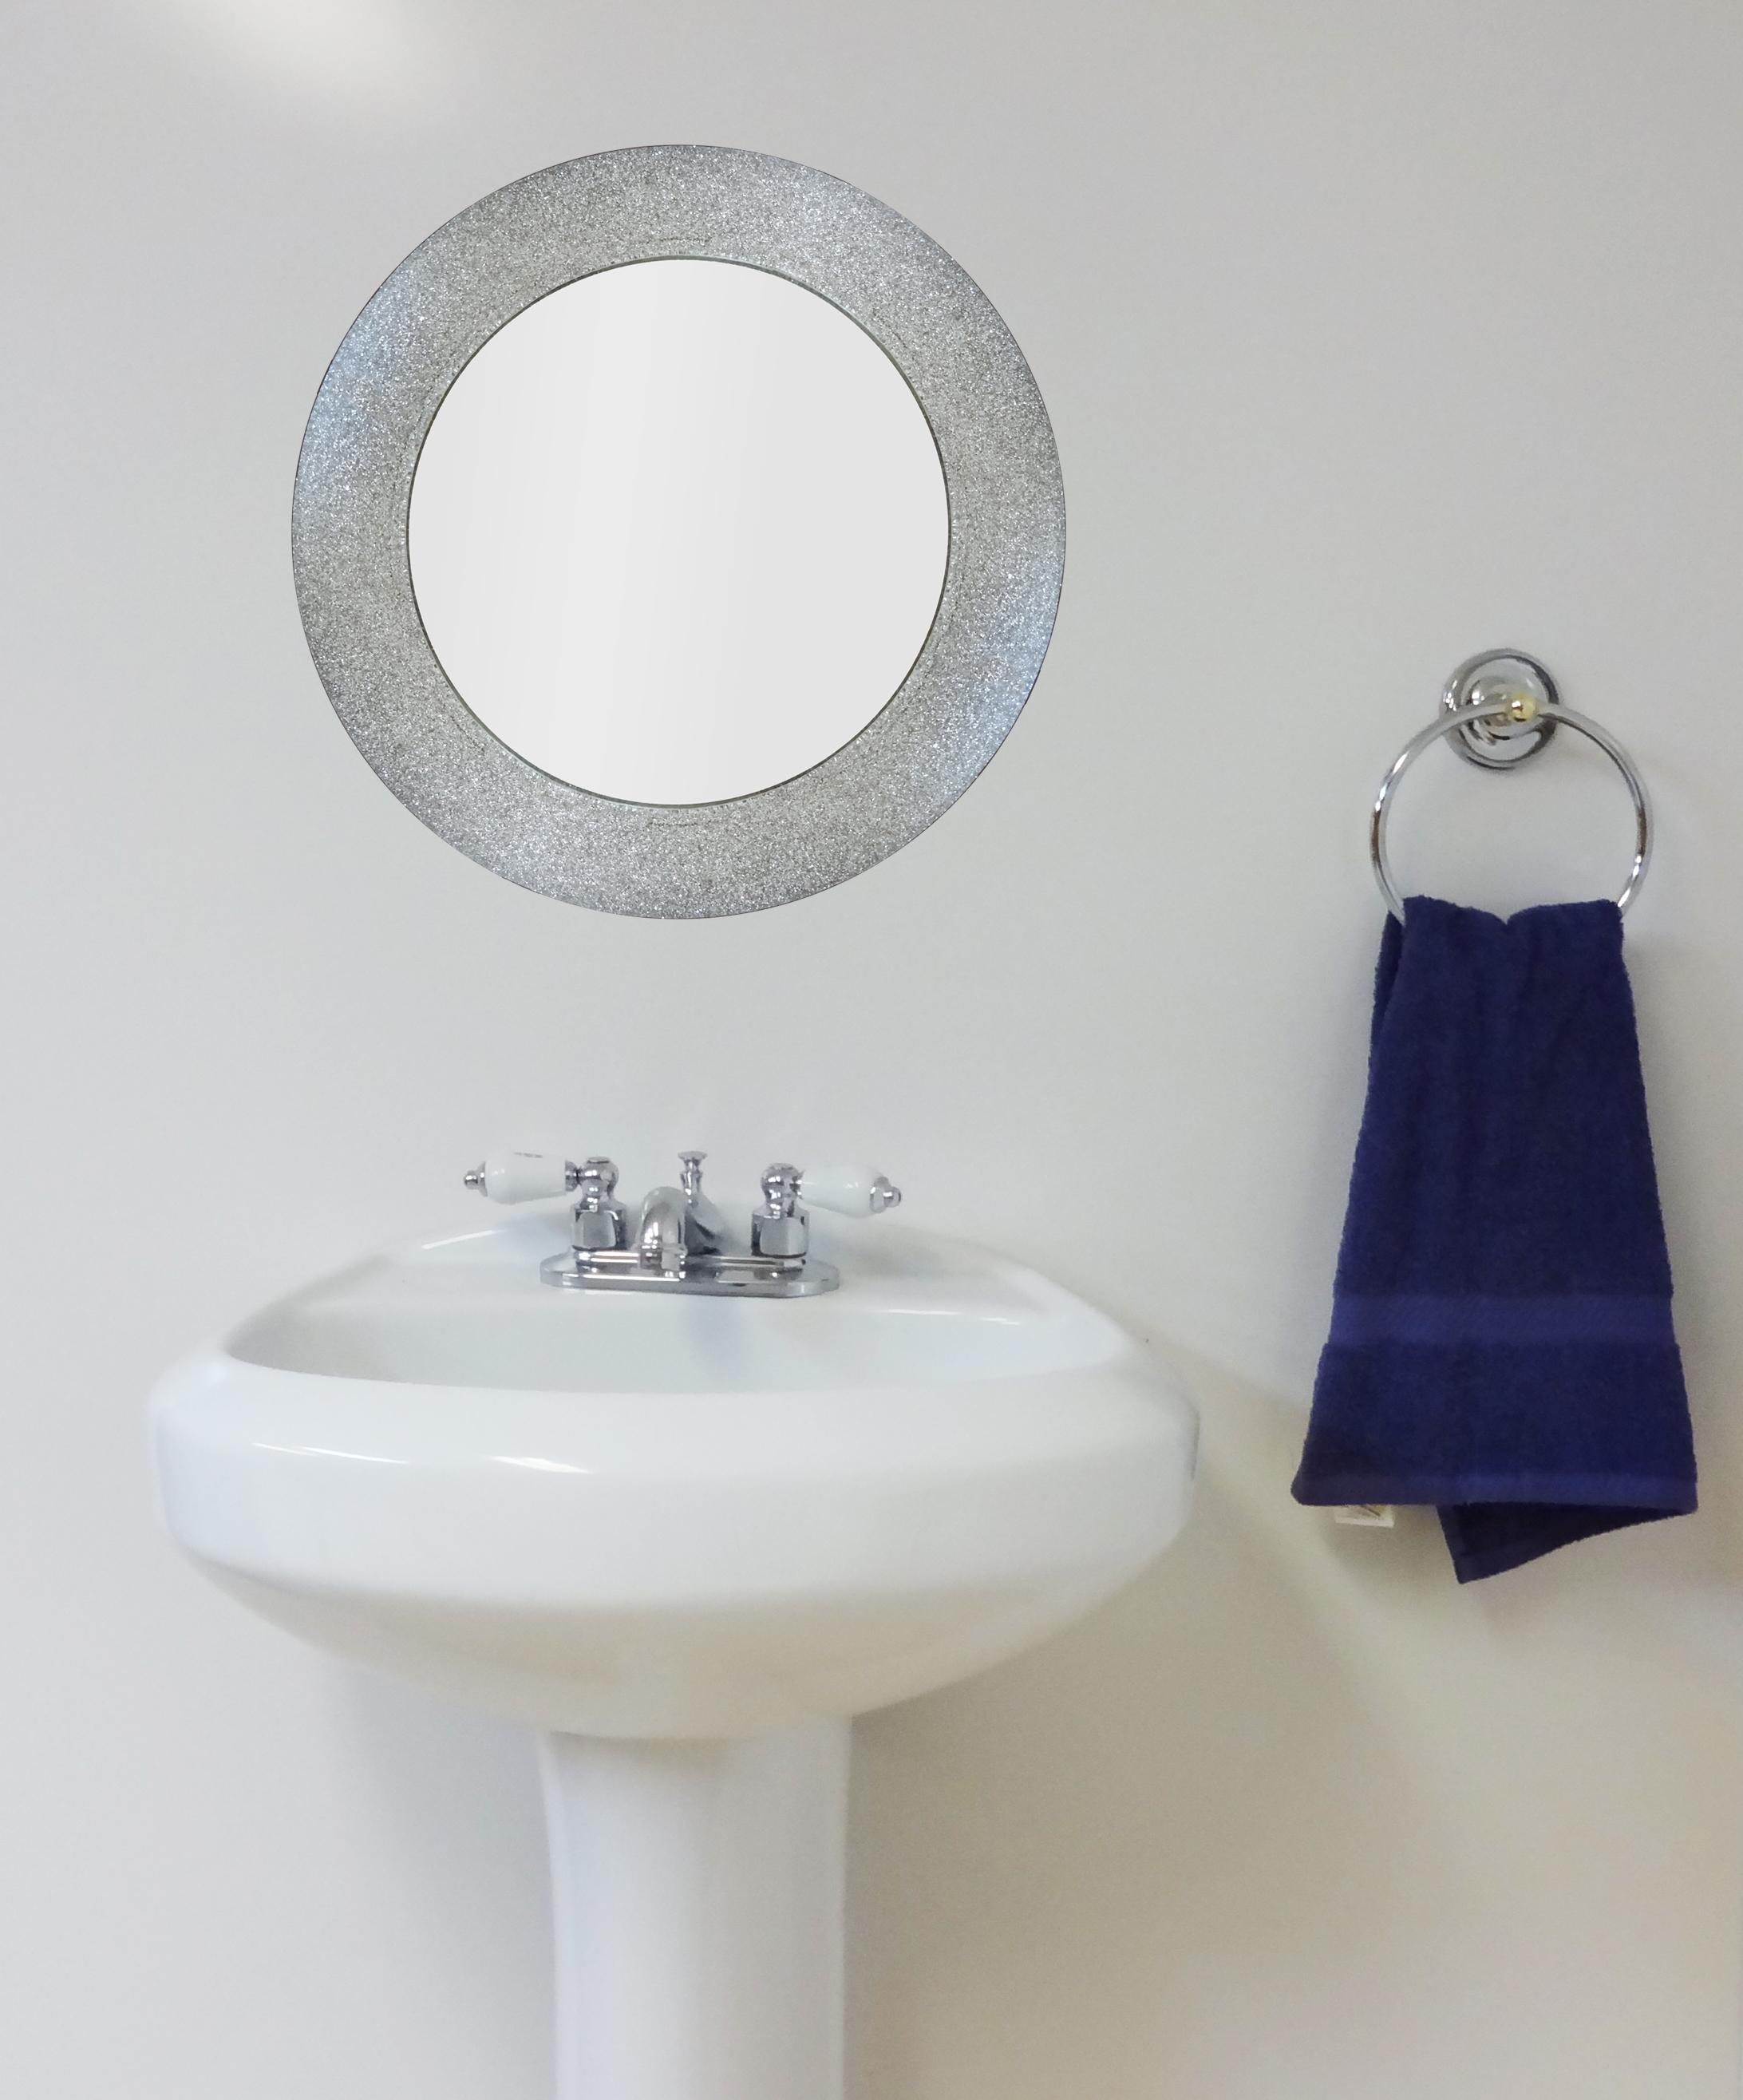 Silver Glitter Mirror Potty Training Concepts In Silver Glitter Mirror (Image 12 of 15)